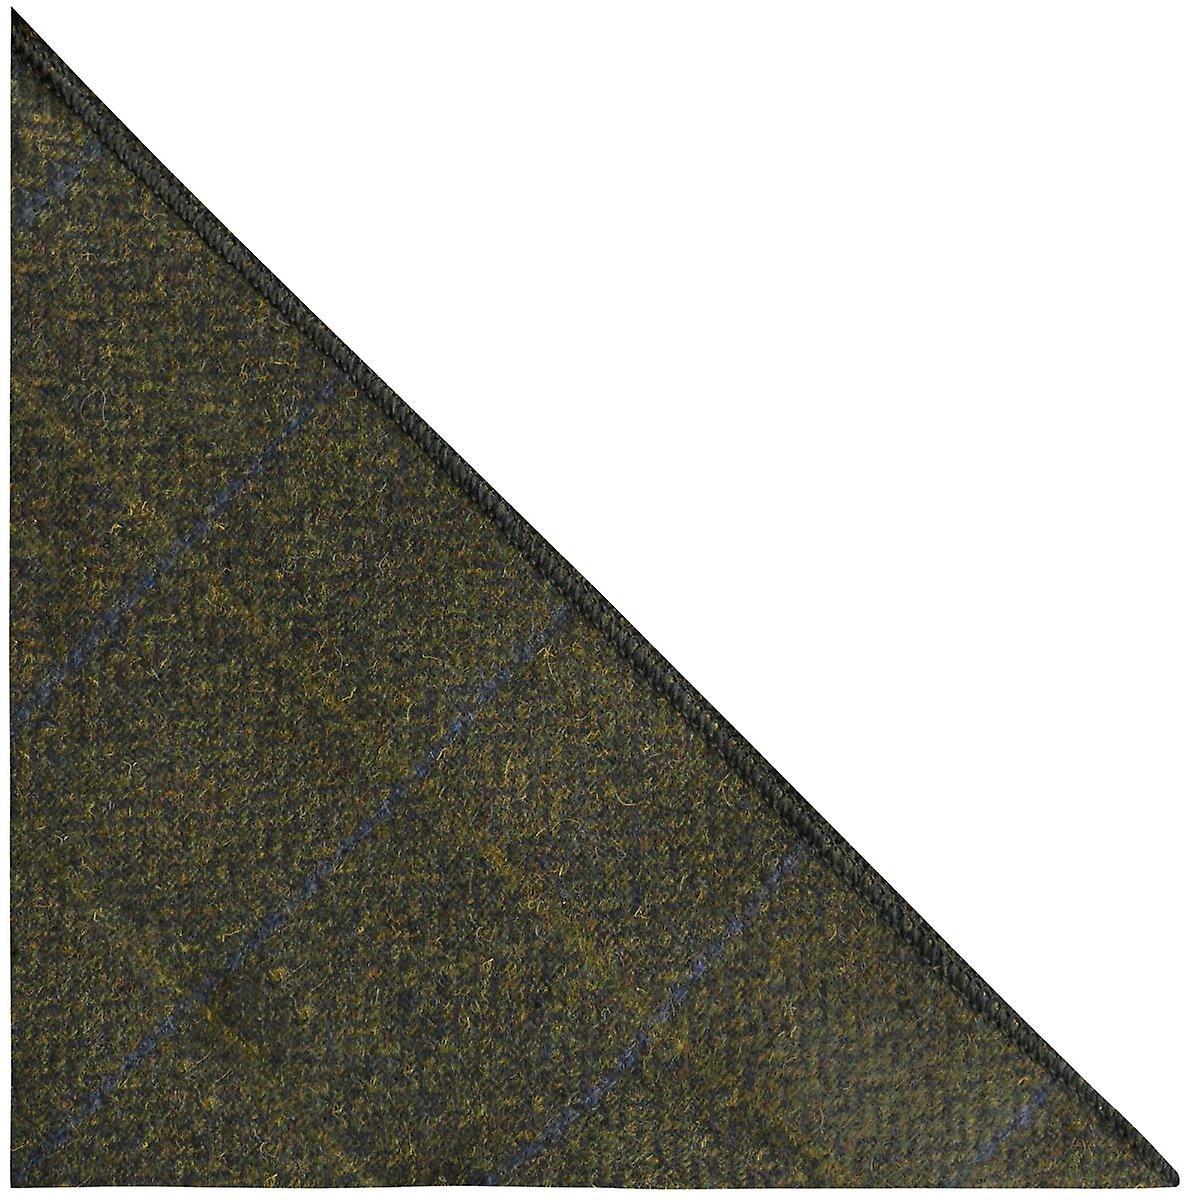 Luxury Juniper Green Herringbone Check Pocket Square, Handkerchief, Tweed